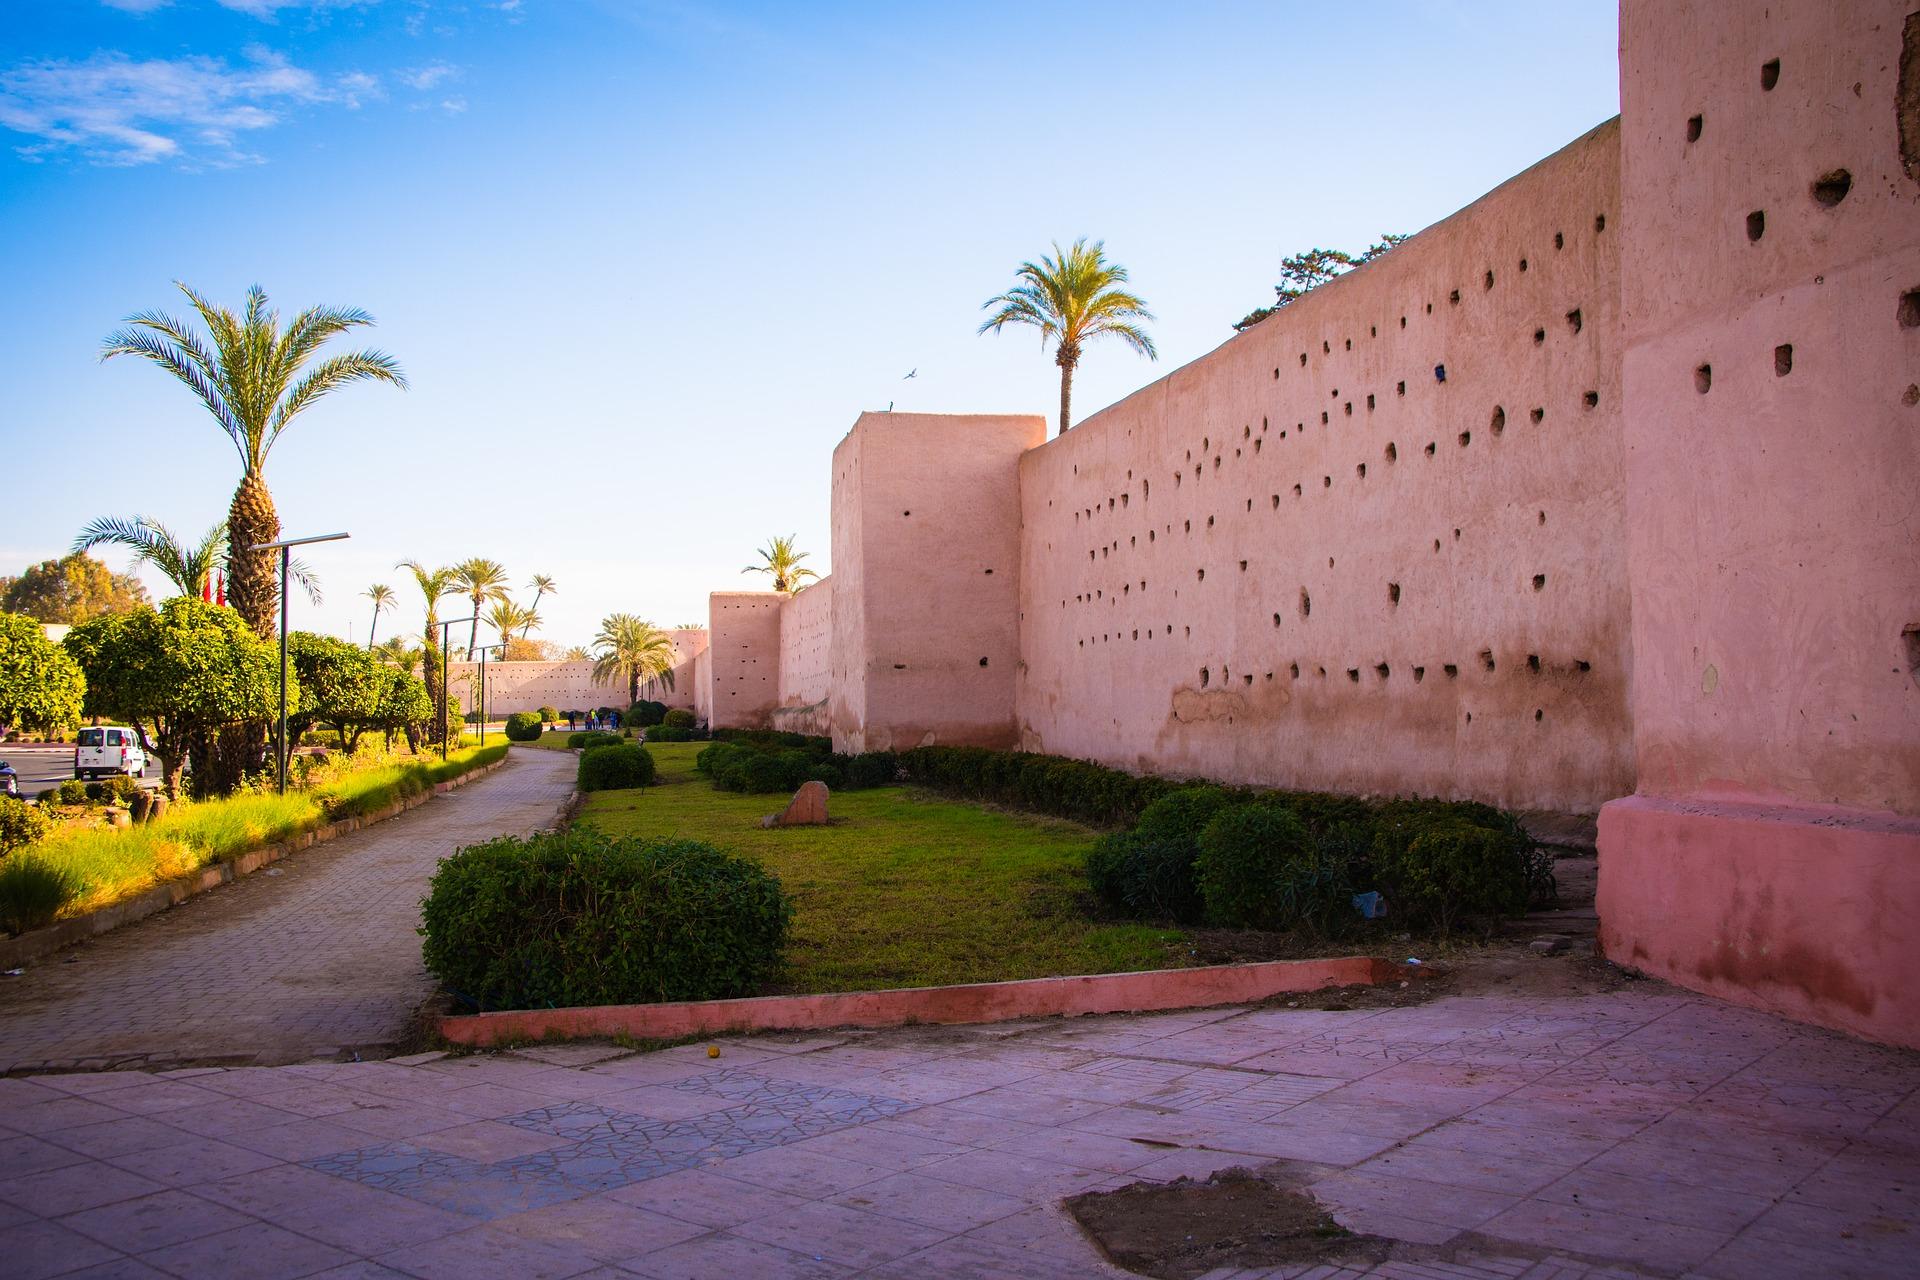 morocco-2809965_1920